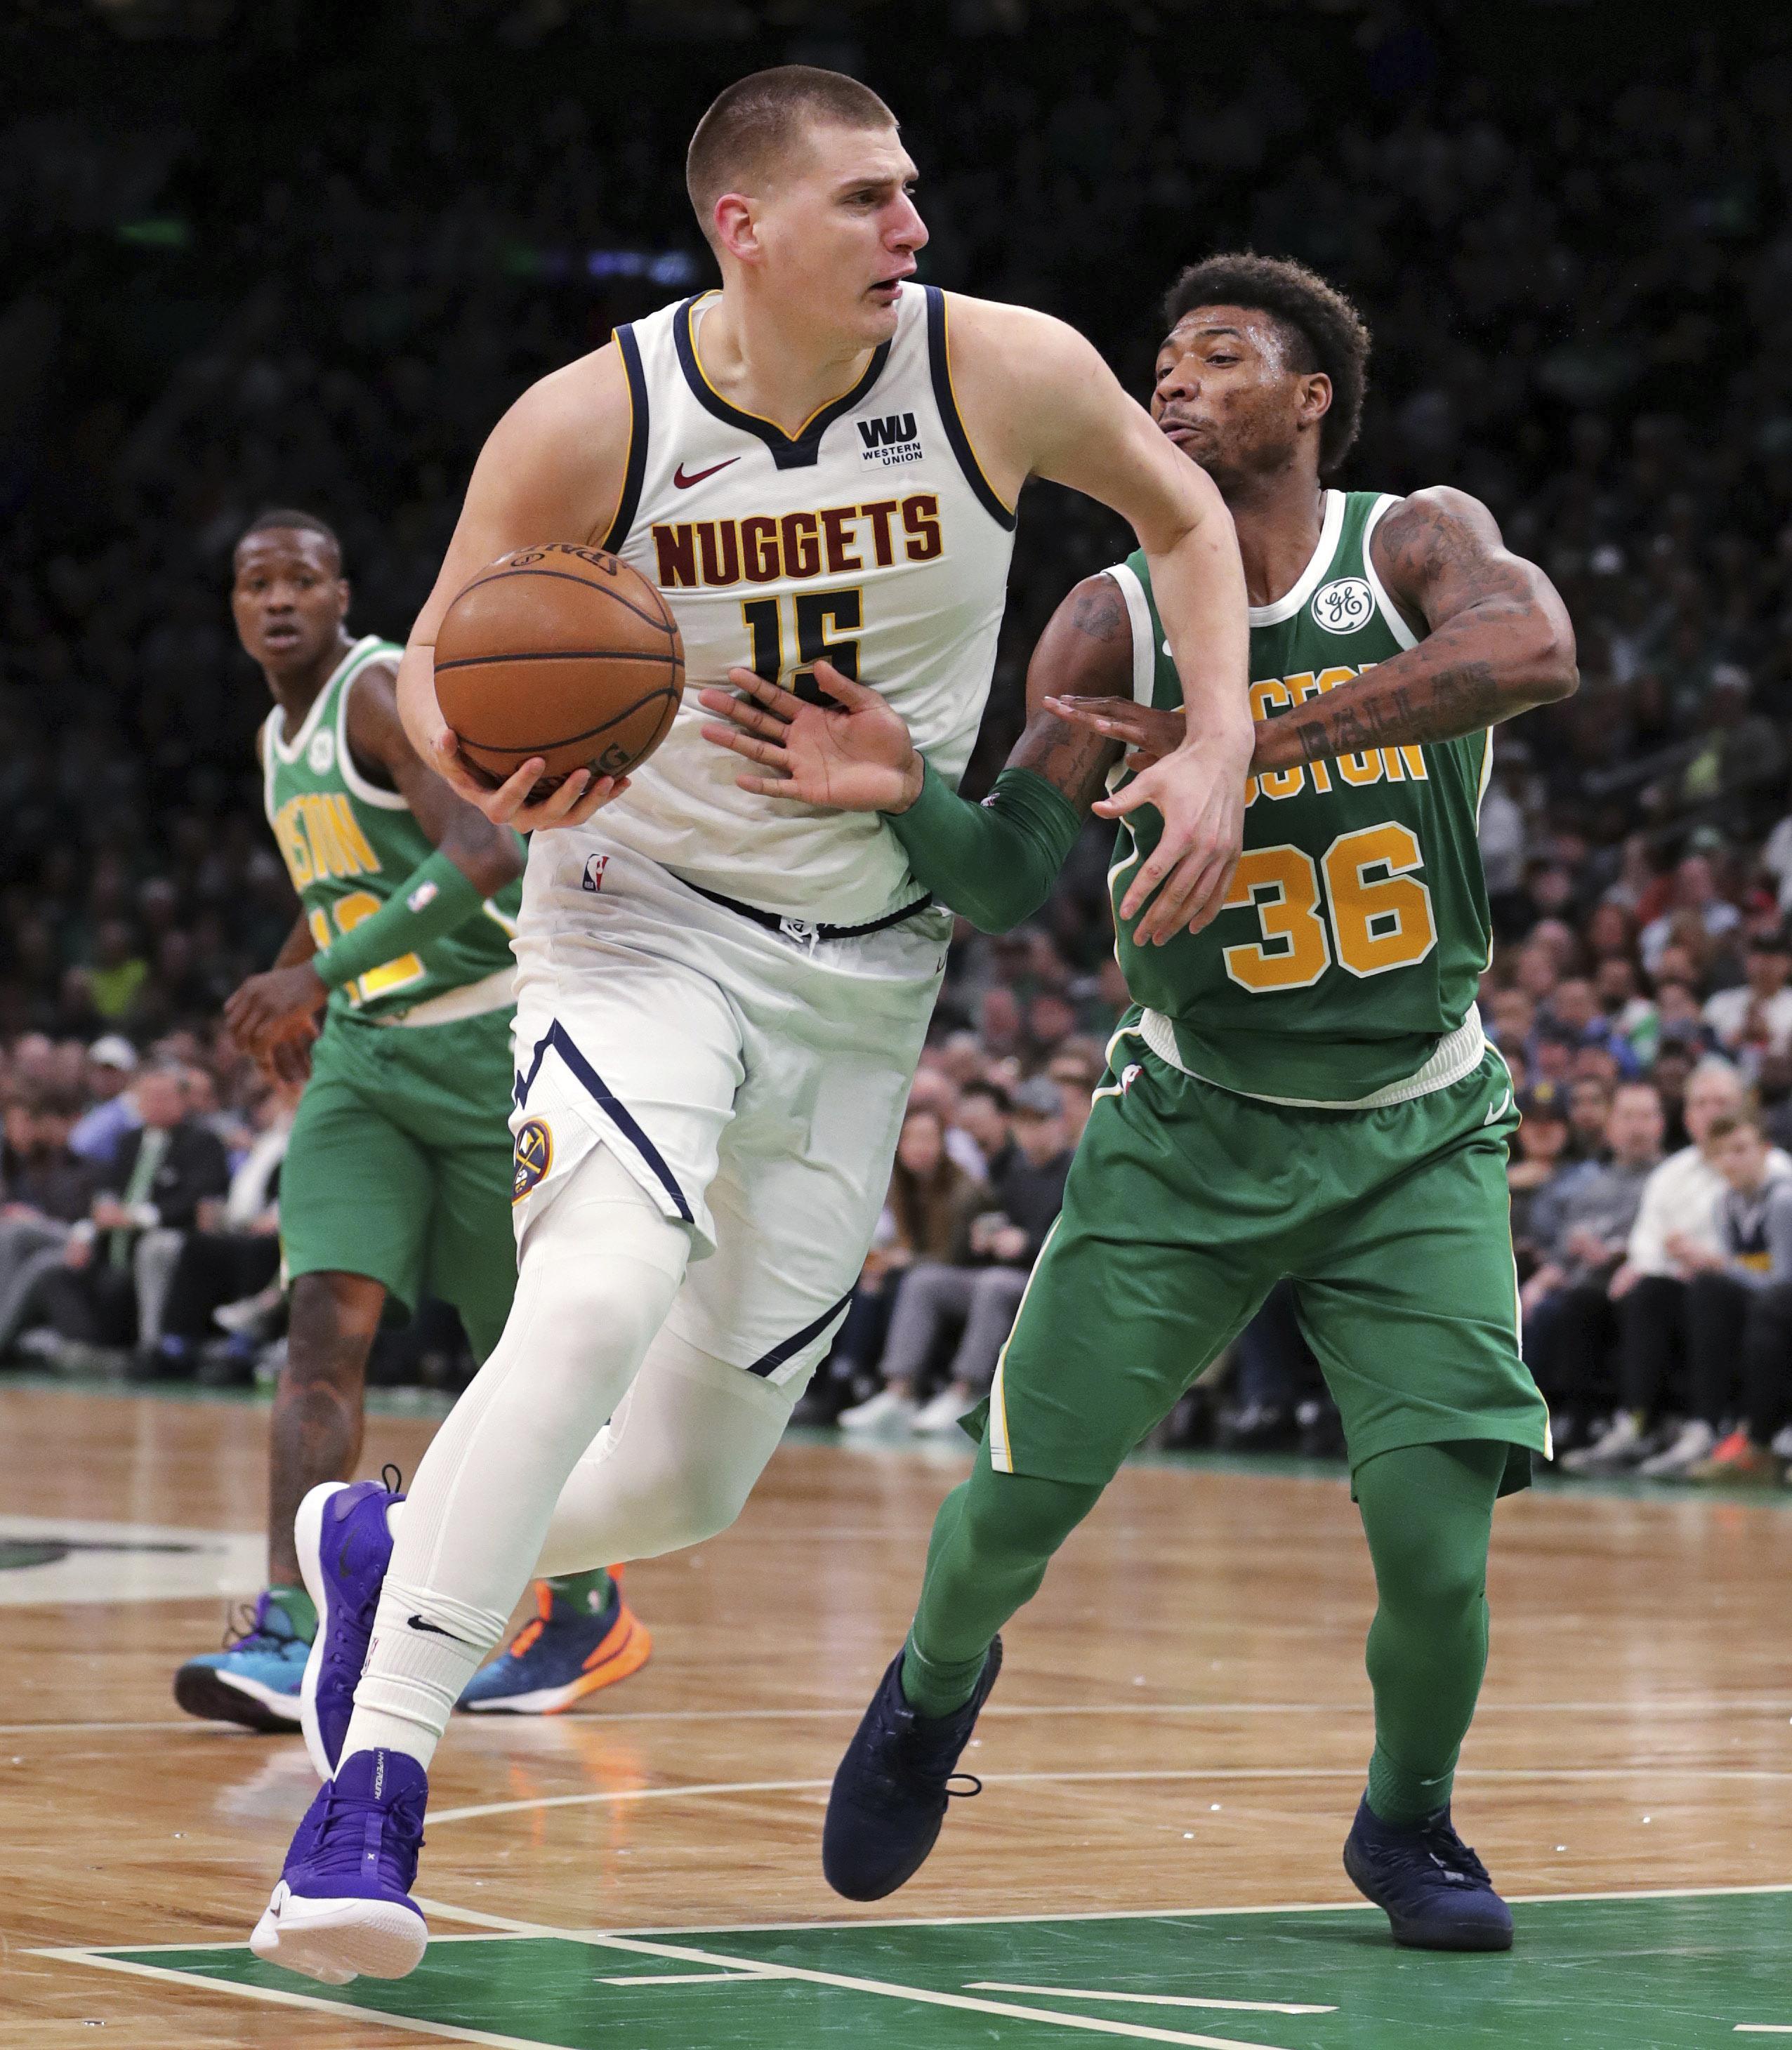 Nuggets clinch playoff spot with win over Celtics - Washington Times 4a3810e1e